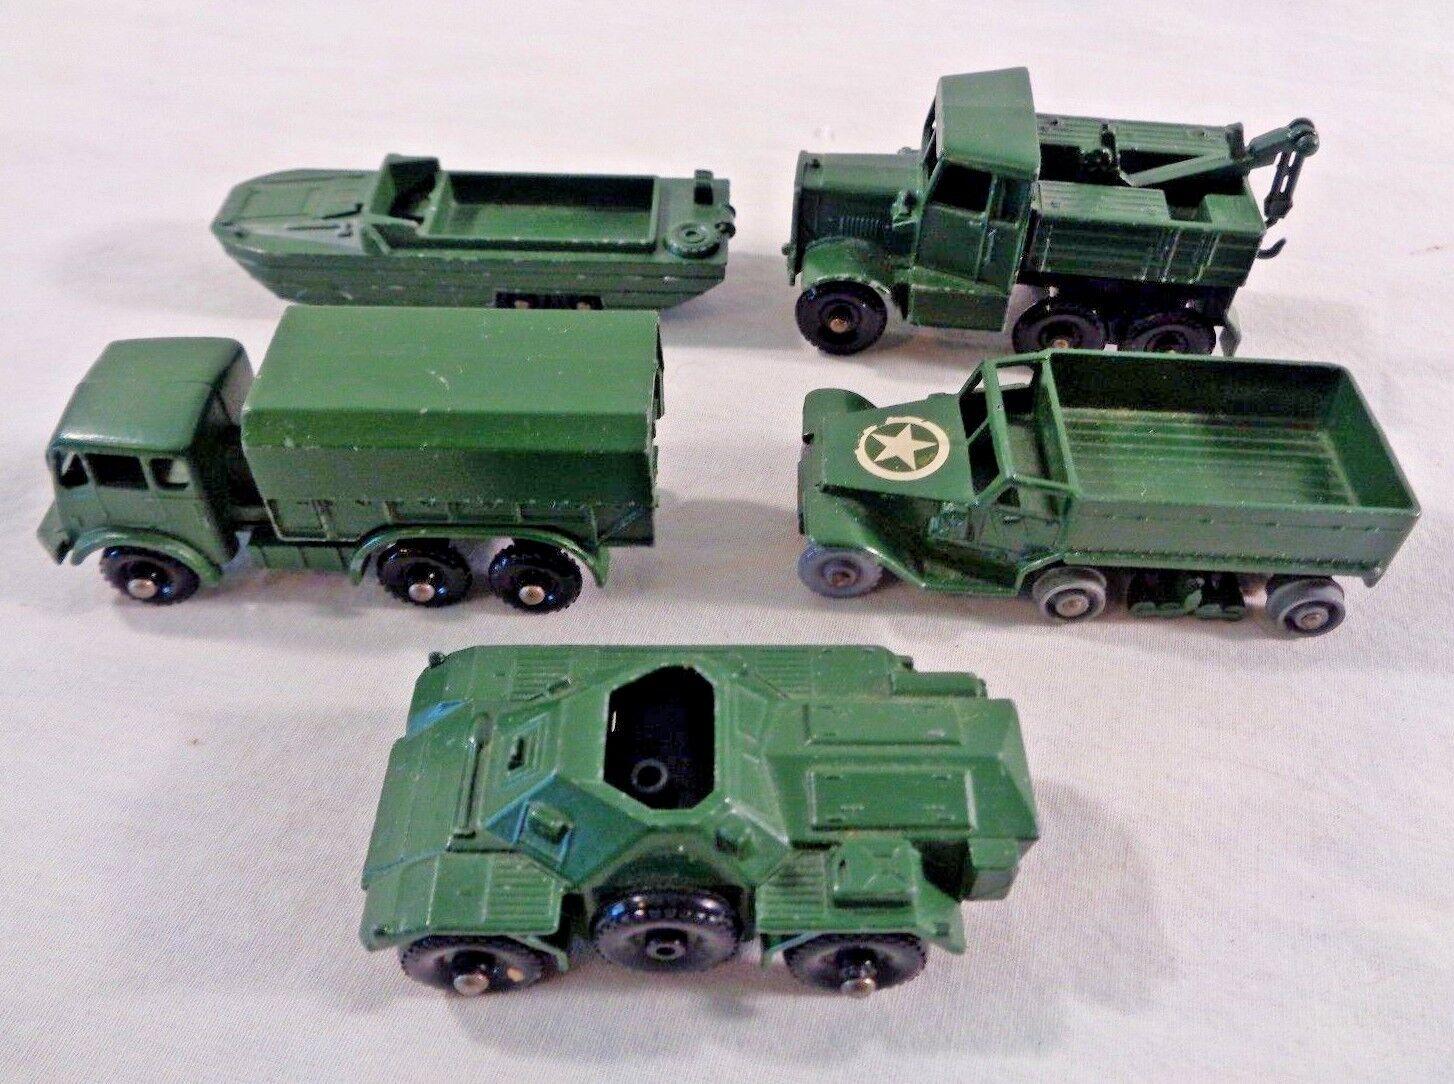 Vintage Lesney Matchbox Diecast Military Lot Of 5 Vehicles No. 49 55 61 62 64